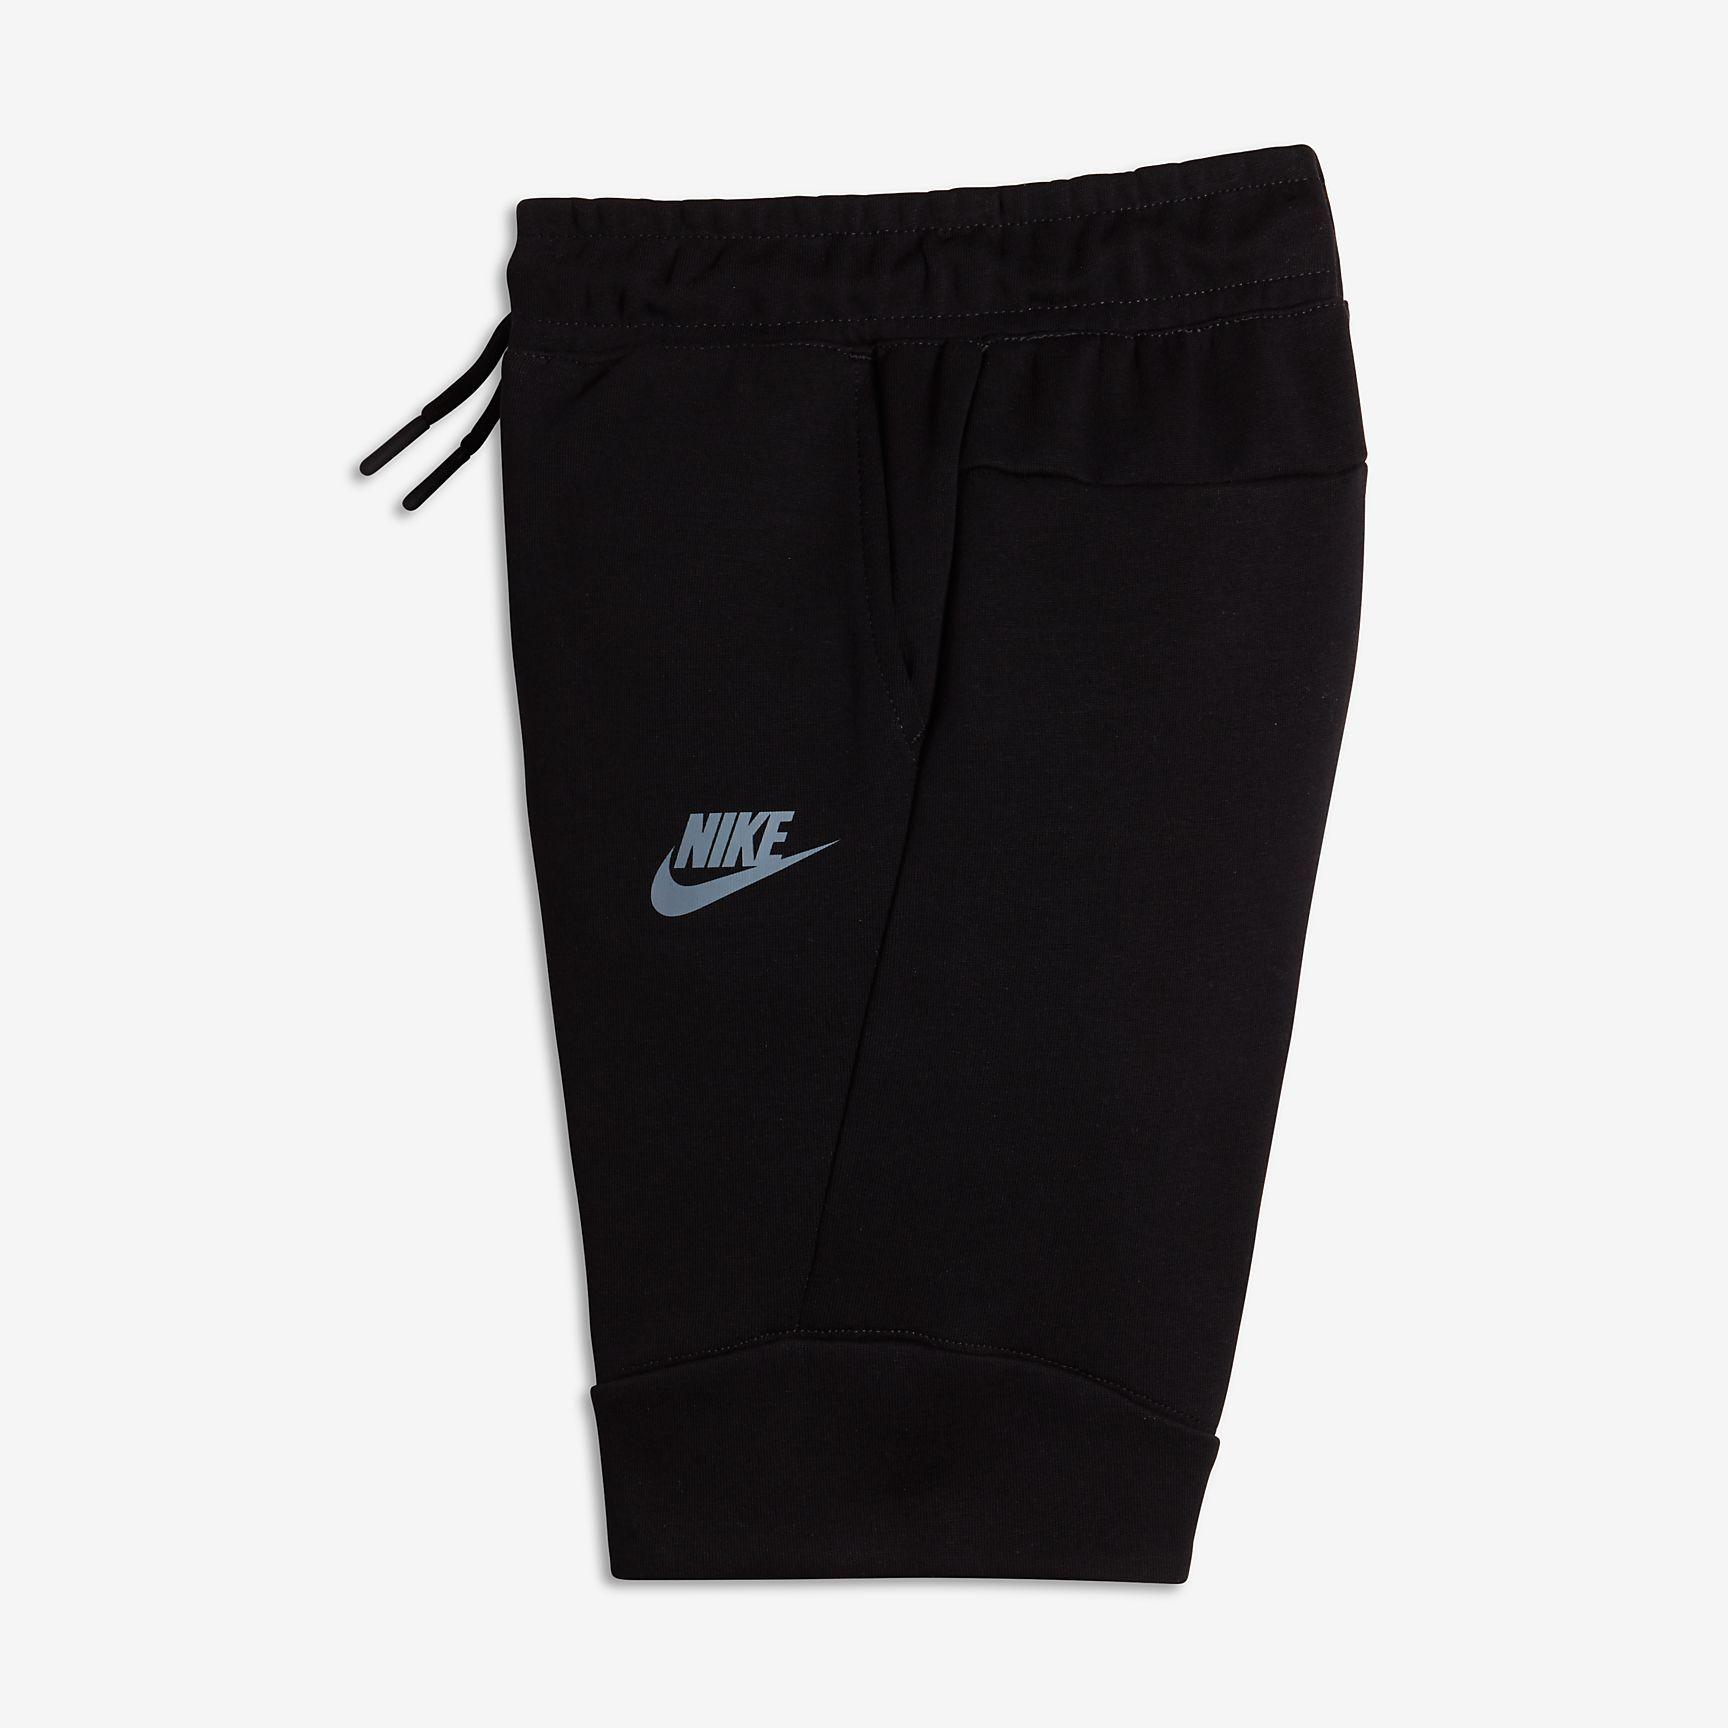 67959d43613 Discover ideas about Boys Basketball Shorts. Nike Jordan Speckle 23 Little  ...